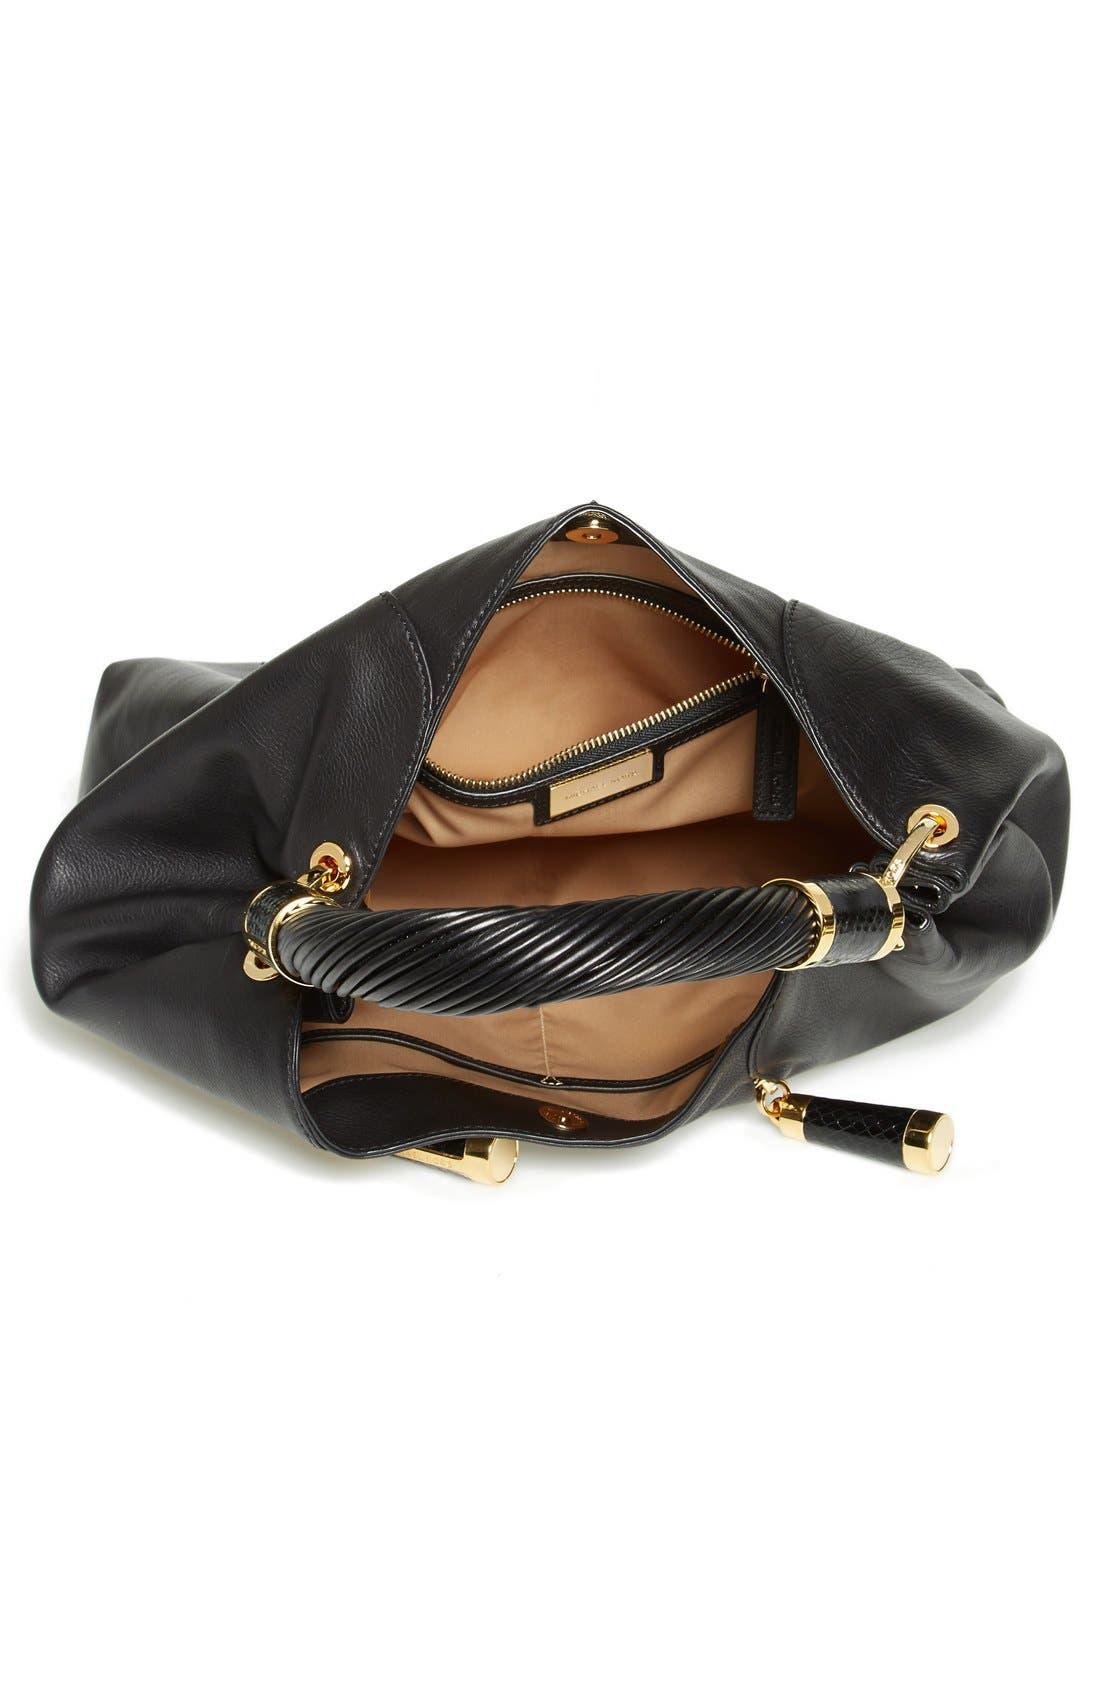 MICHAEL KORS, 'Tonne' Leather Hobo, Alternate thumbnail 4, color, 001